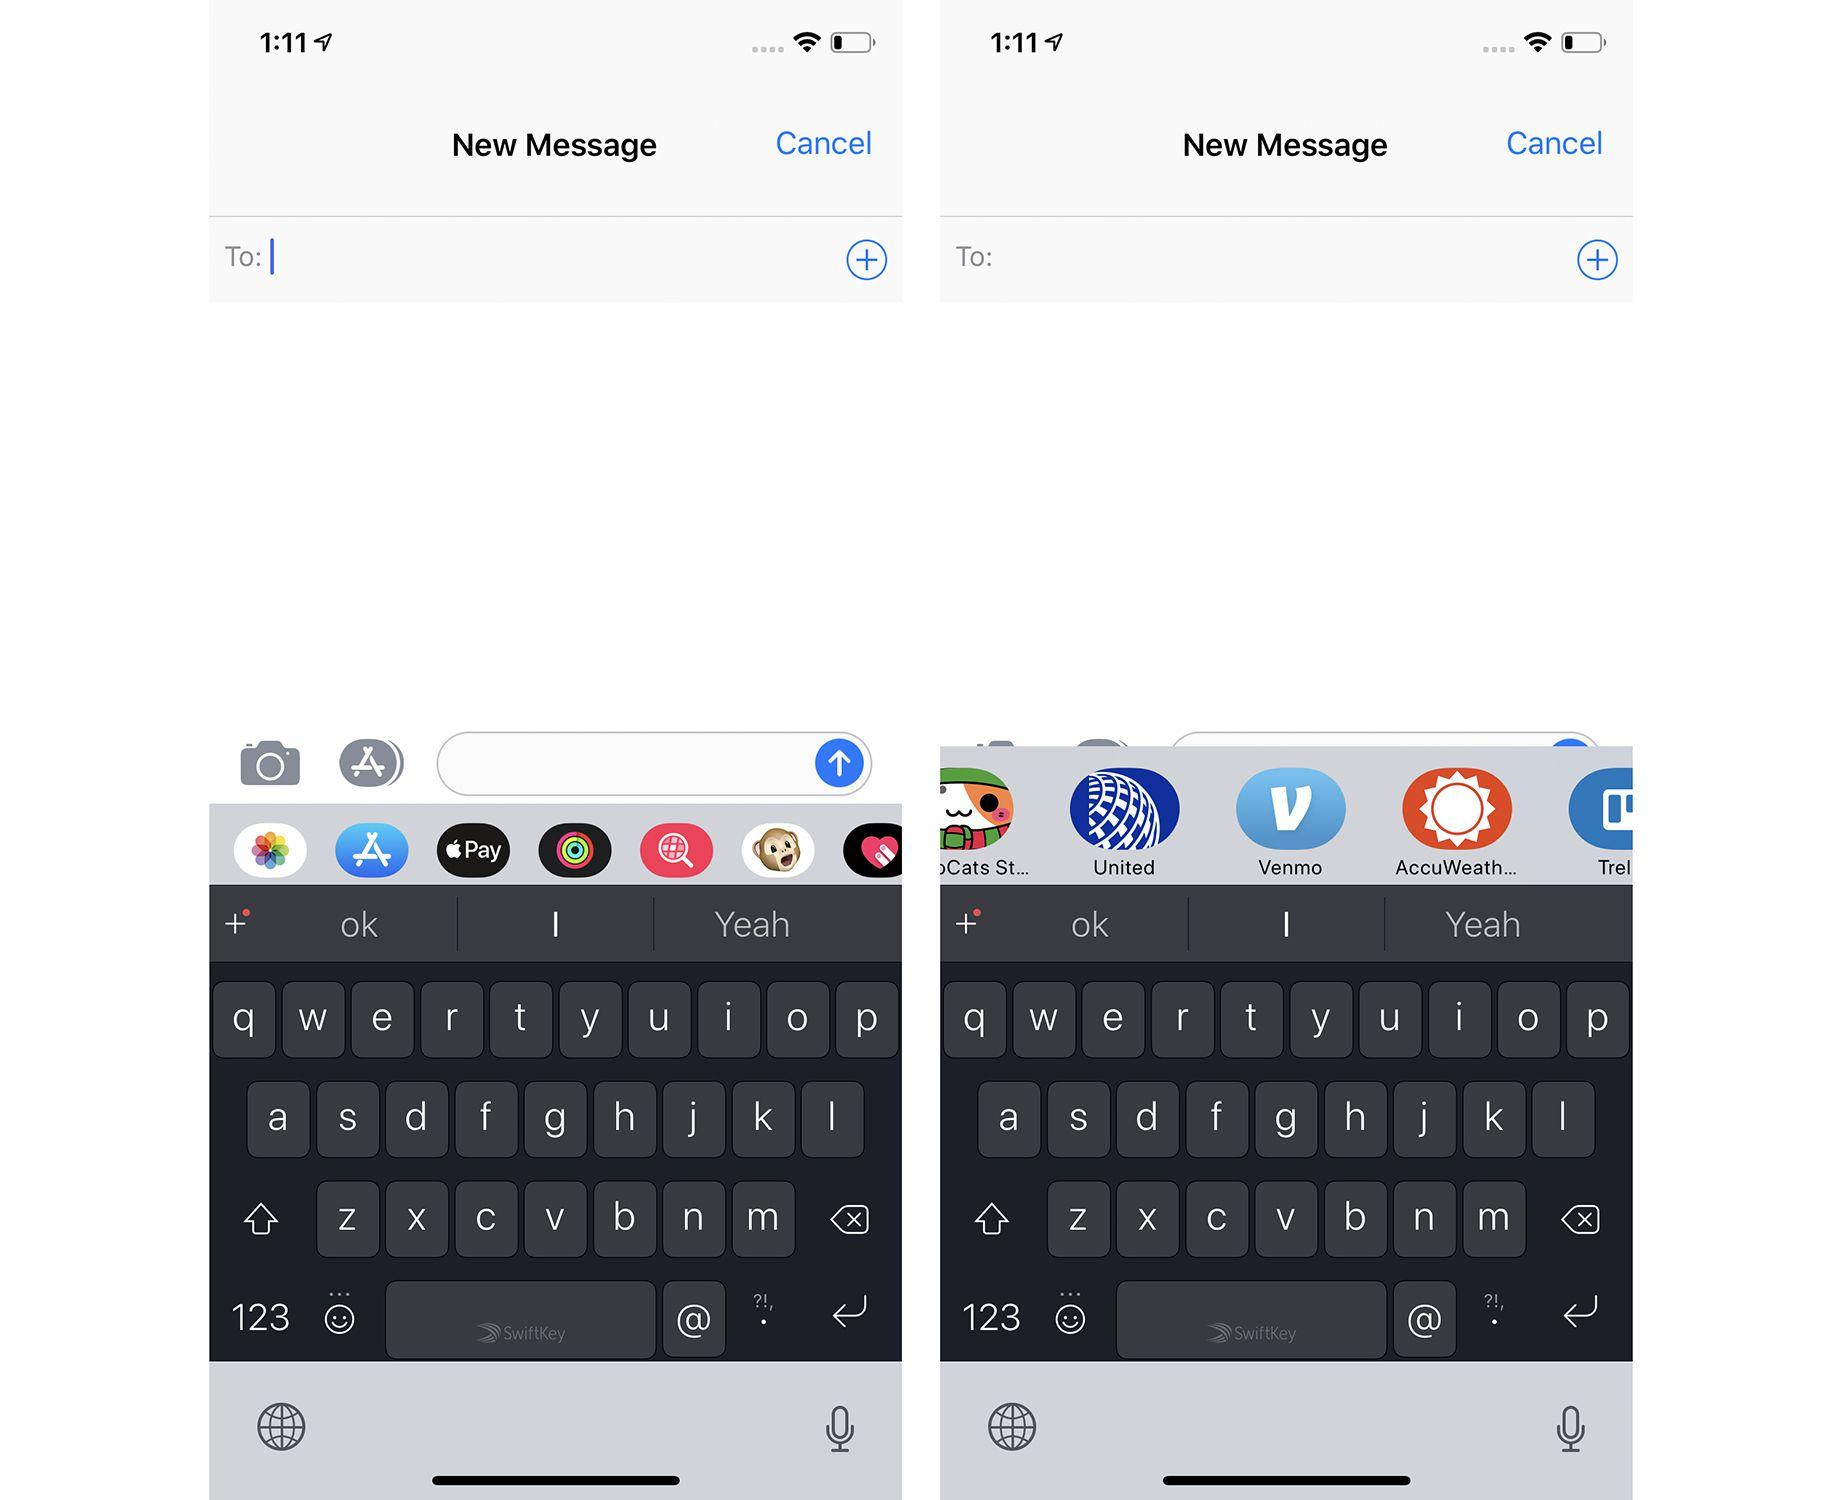 Screenshots of using iMessage apps